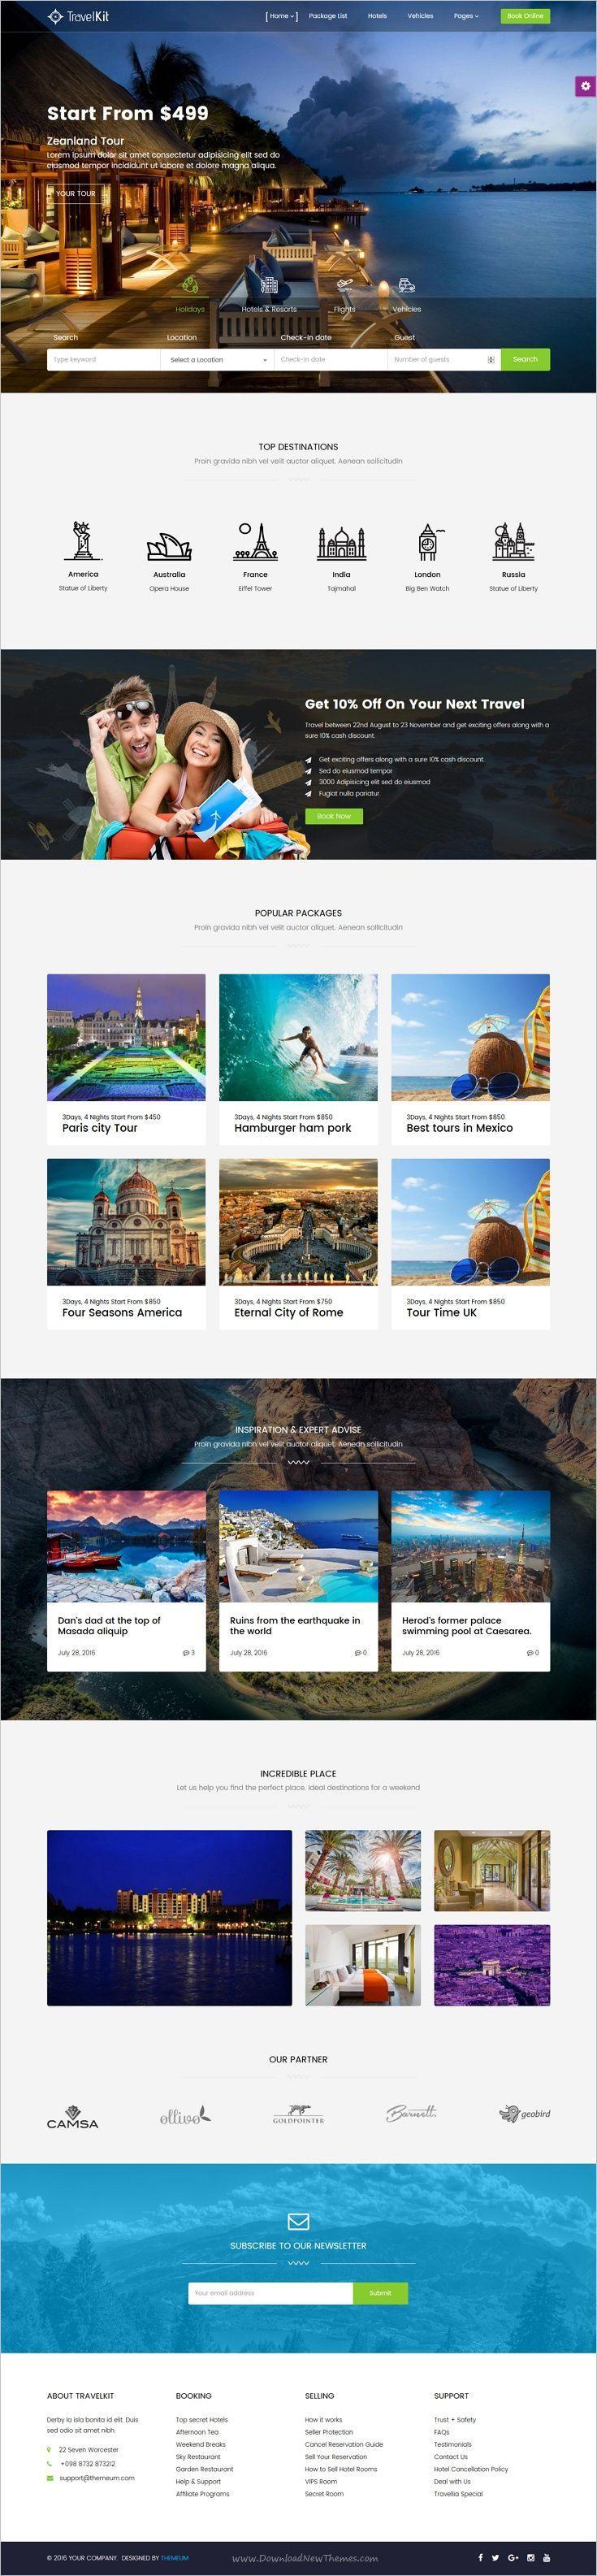 TravelKit is a wonderful responsive #WordPress 5x theme for the #tourism sector, #travel agencies, tour arrangement #companies website download now➩ https://themeforest.net/item/travelkit-the-fullfledged-tour-travel-wordpress-theme/18443964?ref=Datasata Está farto de procurar por templates WordPress? Fizemos um E-Book GRATUITO com OS 150 MELHORES TEMPLATES WORDPRESS. Clique aqui http://www.estrategiadigital.pt/150-melhores-templates-wordpress/ para fazer download imediato!